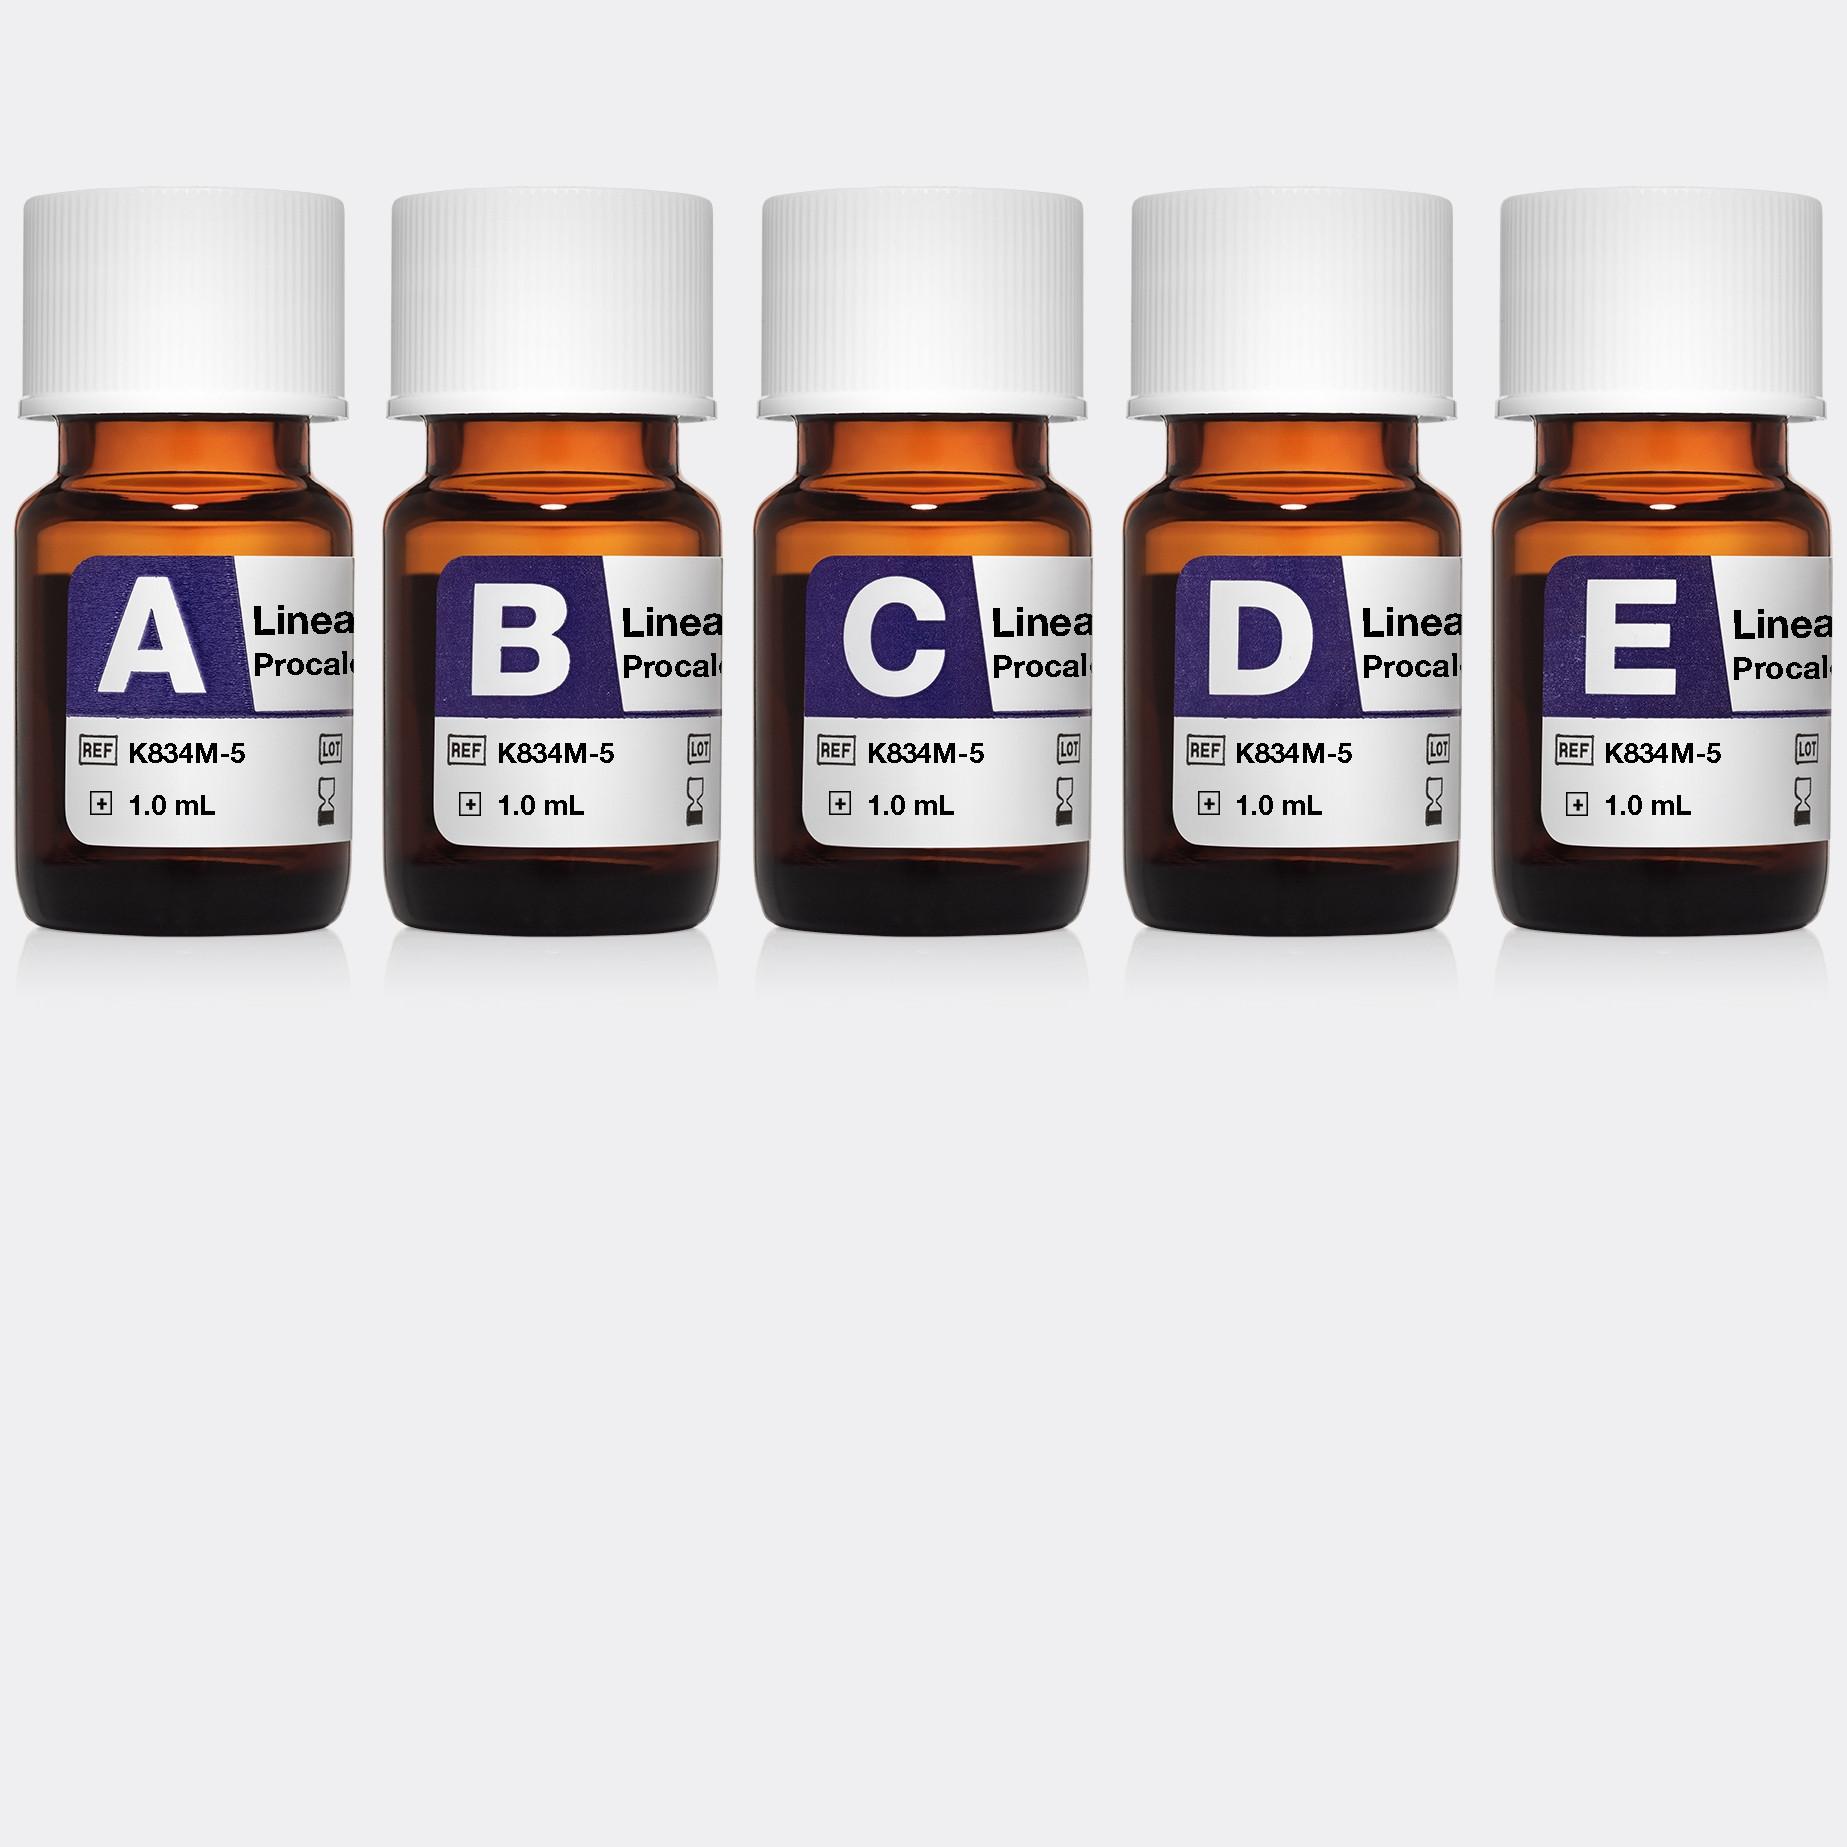 Linearity FD Procalcitonin Abbott Architect i Series